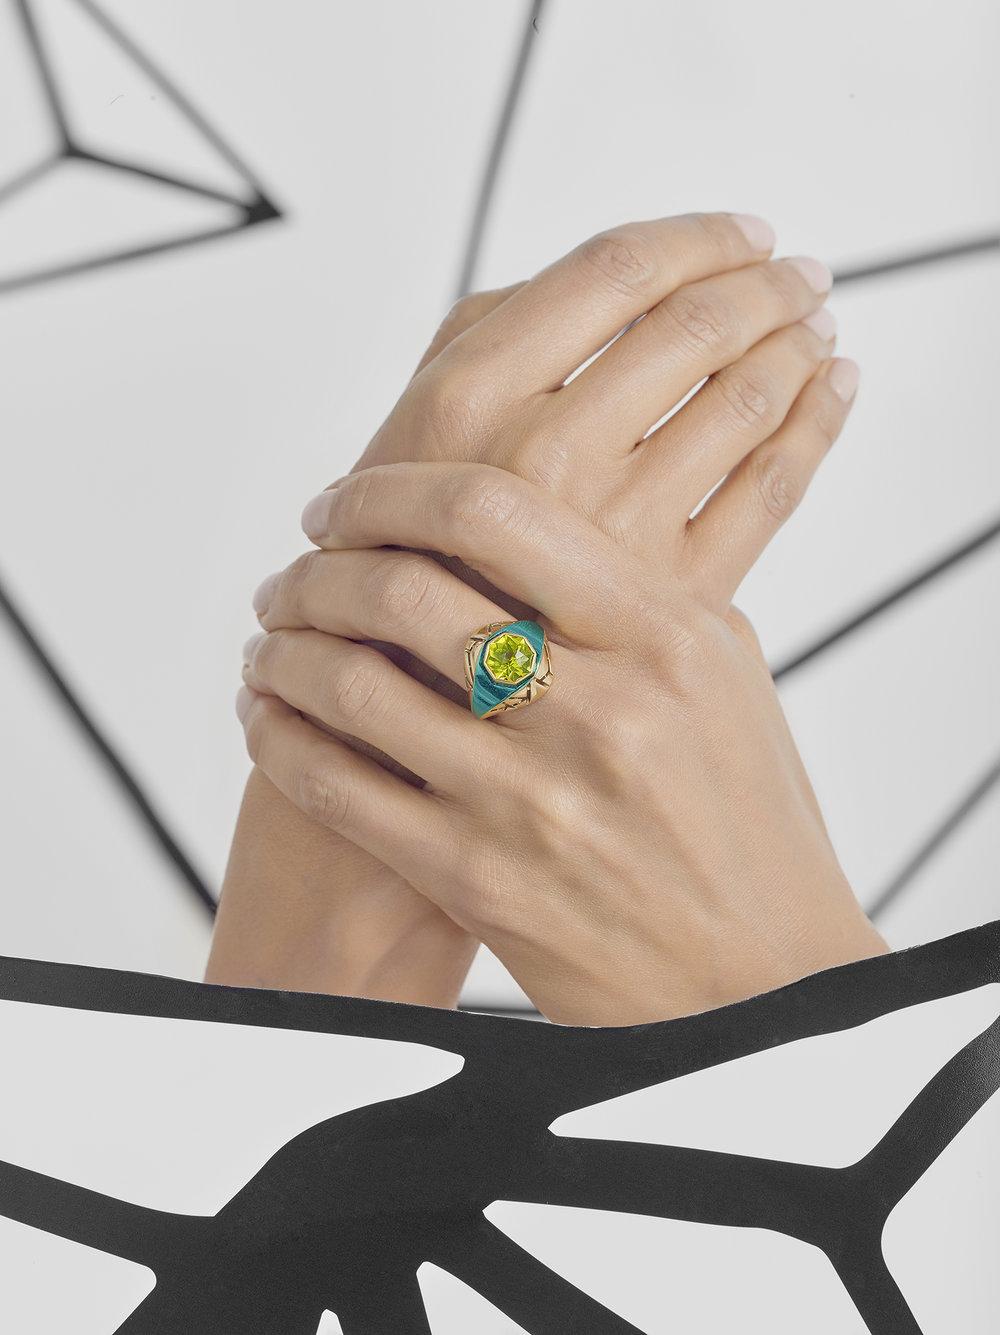 Chromanteq Peridot Bombe Ring.jpg